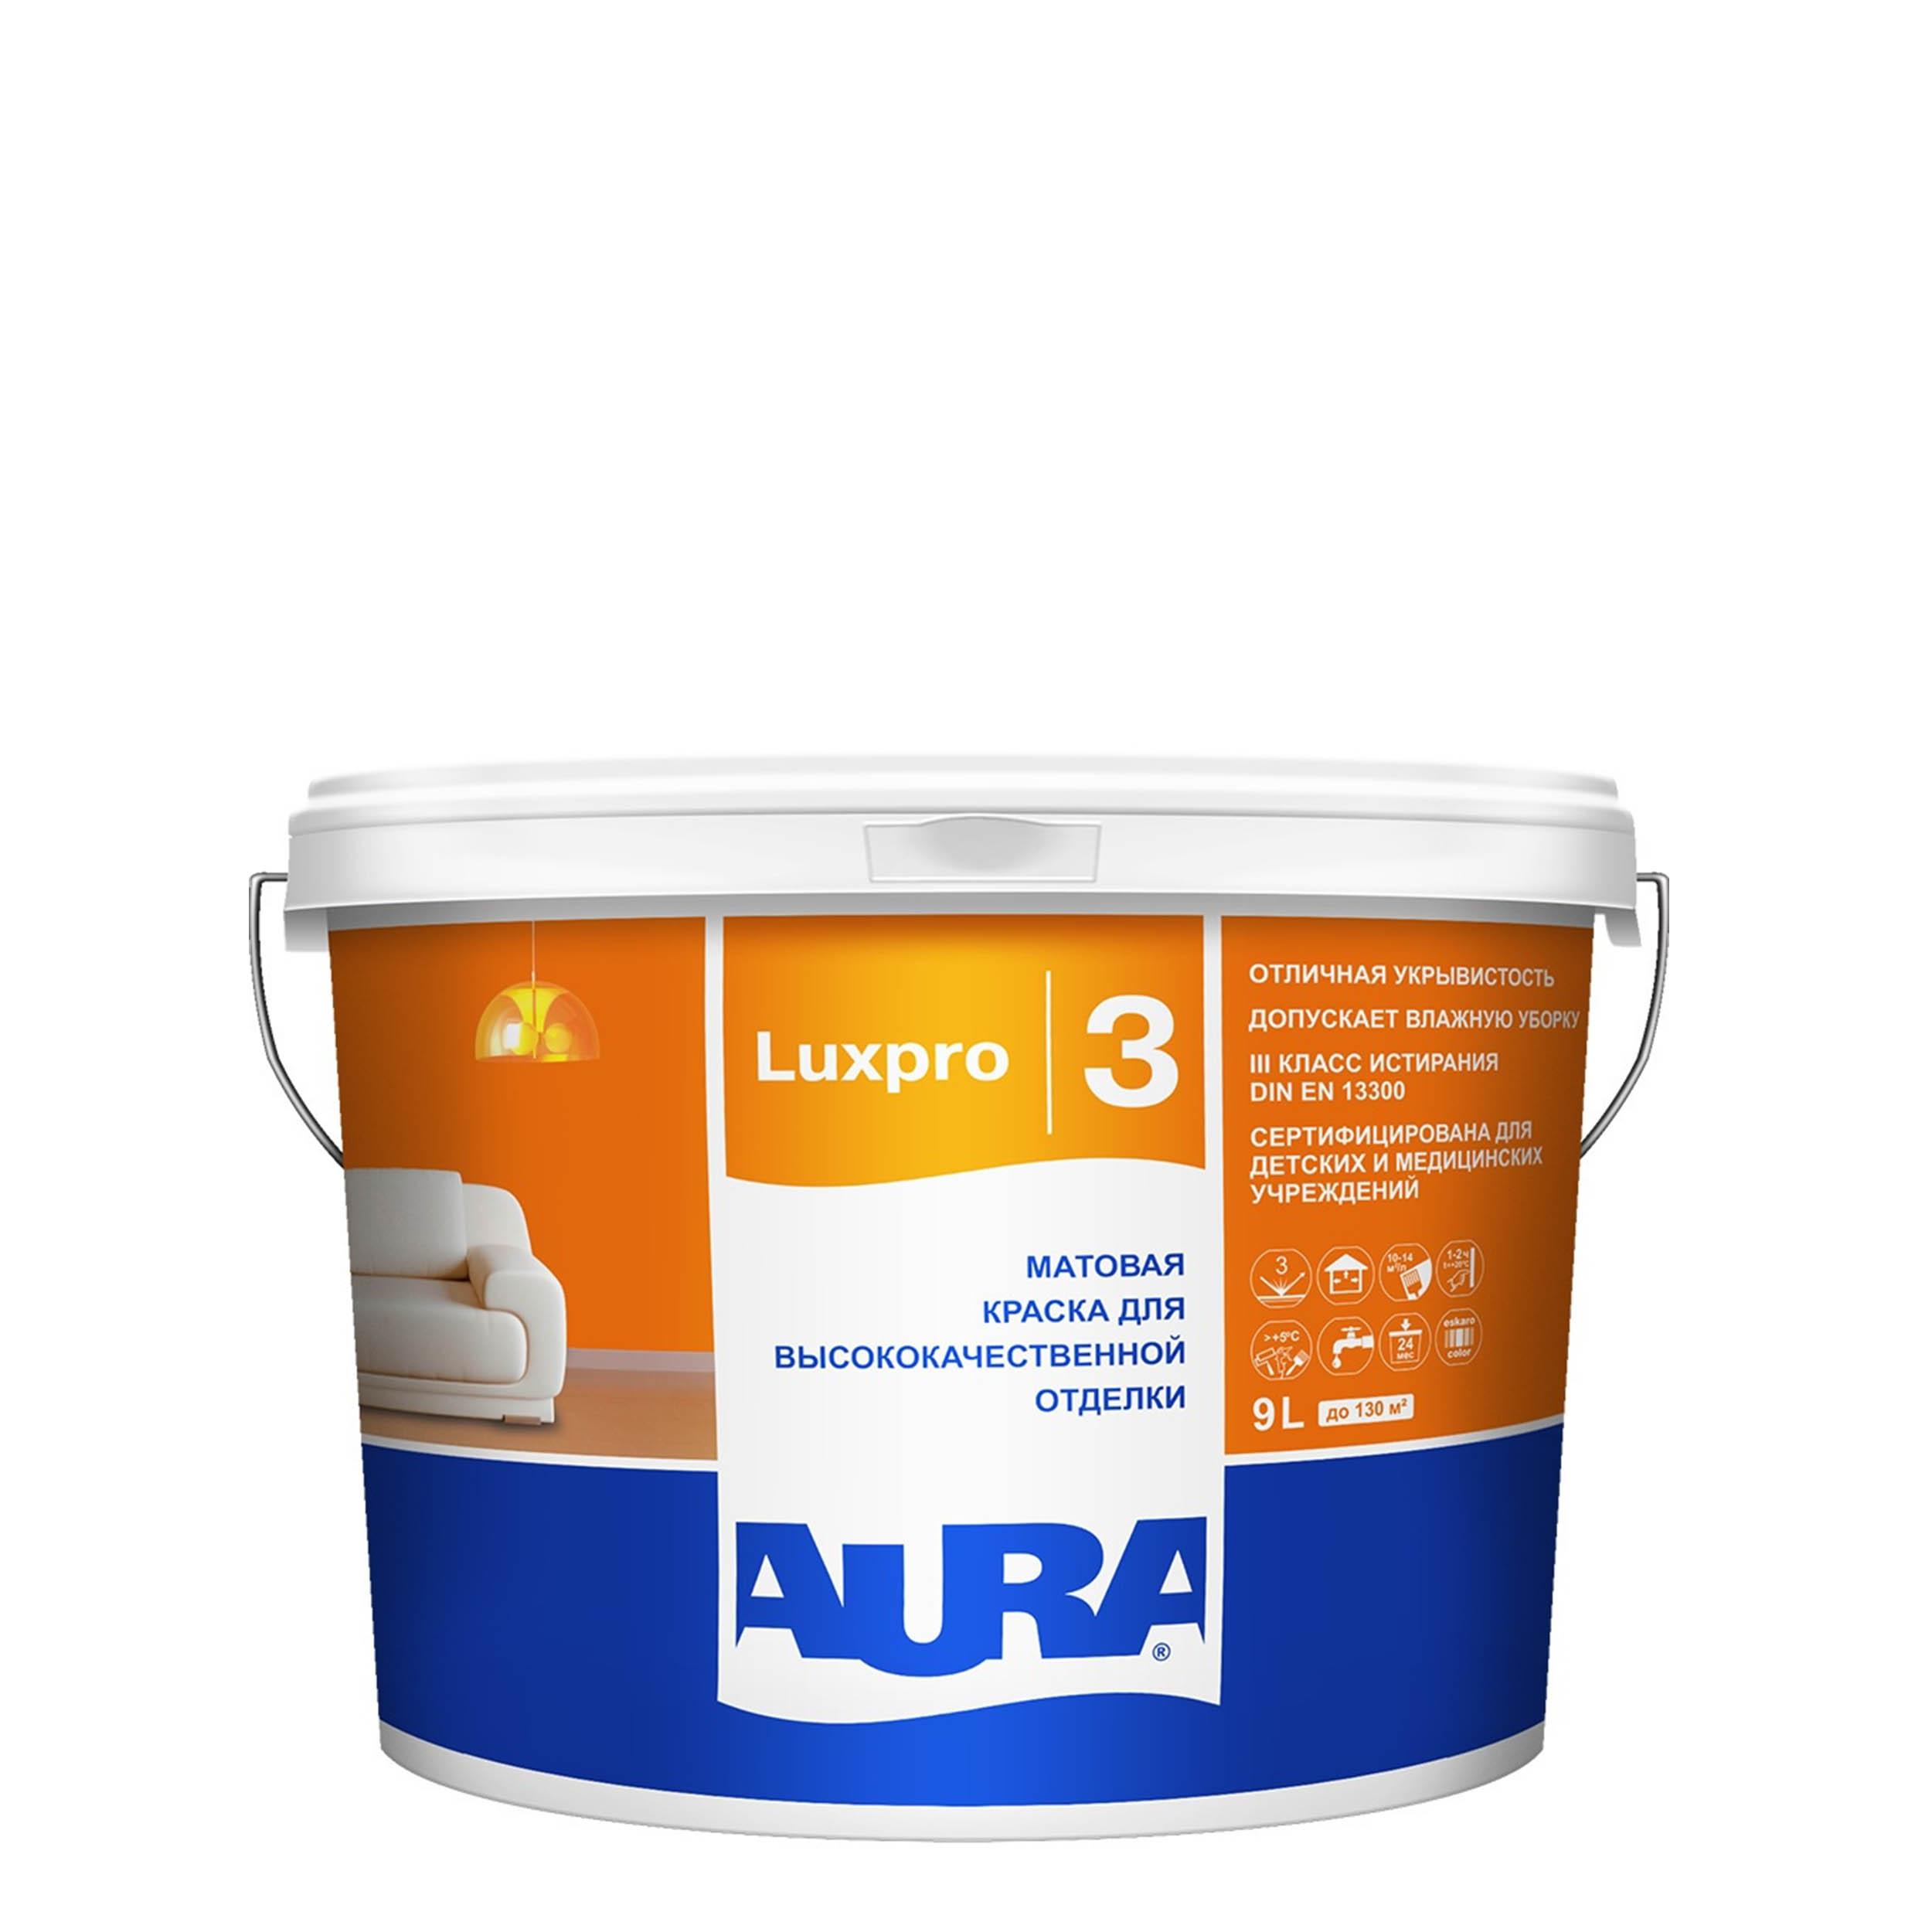 Фото 4 - Краска интерьерная, Aura LuxPRO 3, RAL 3005, 11 кг.